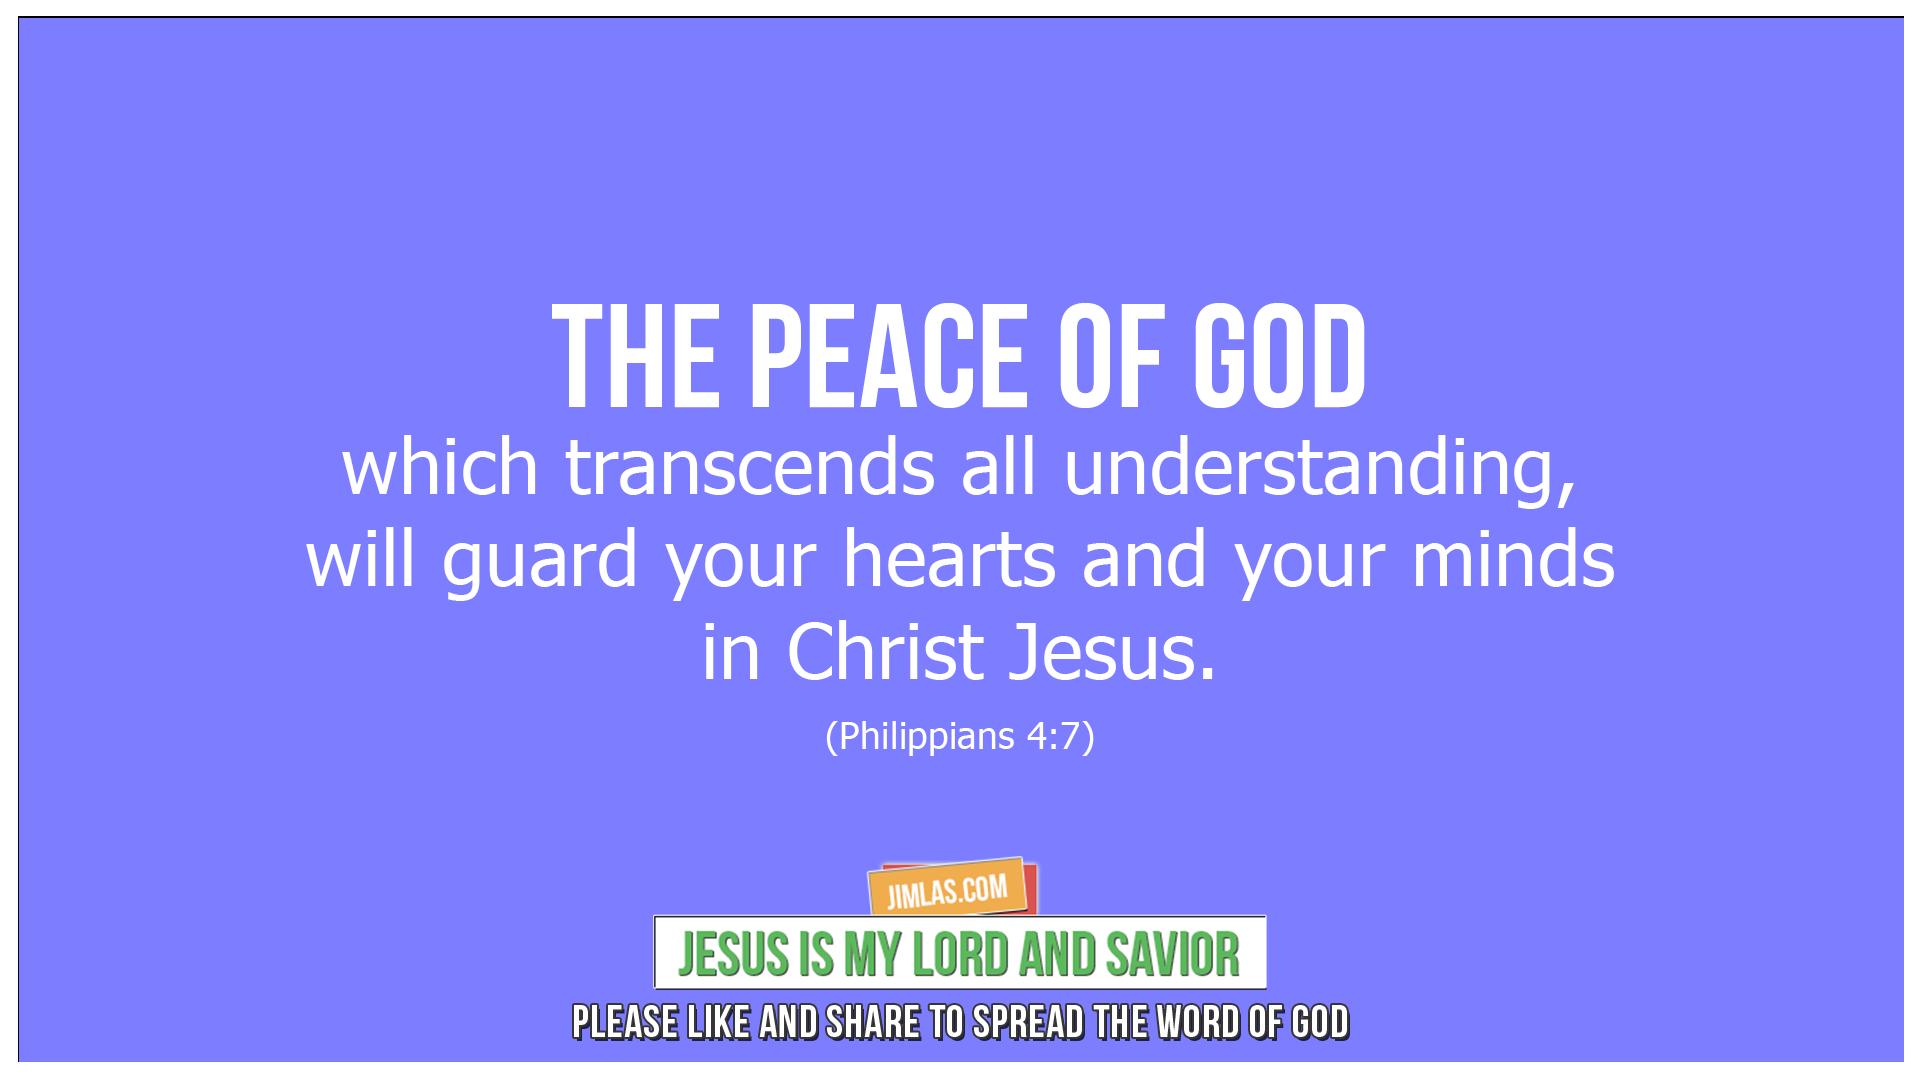 philippians 4 7, Philippians 4:7